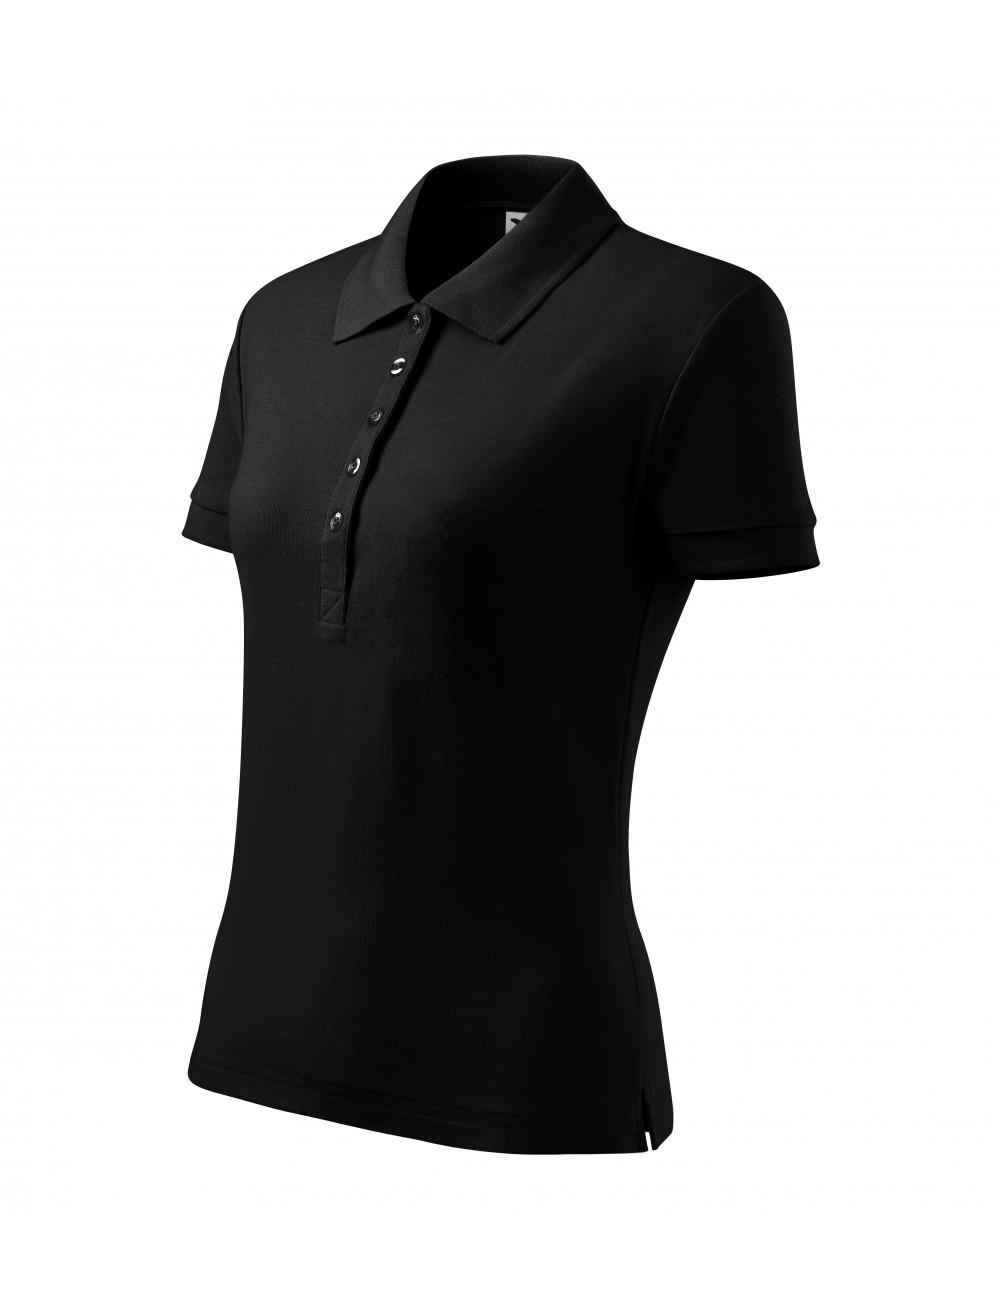 Adler MALFINI Koszulka polo damska Cotton Heavy 216 czarny